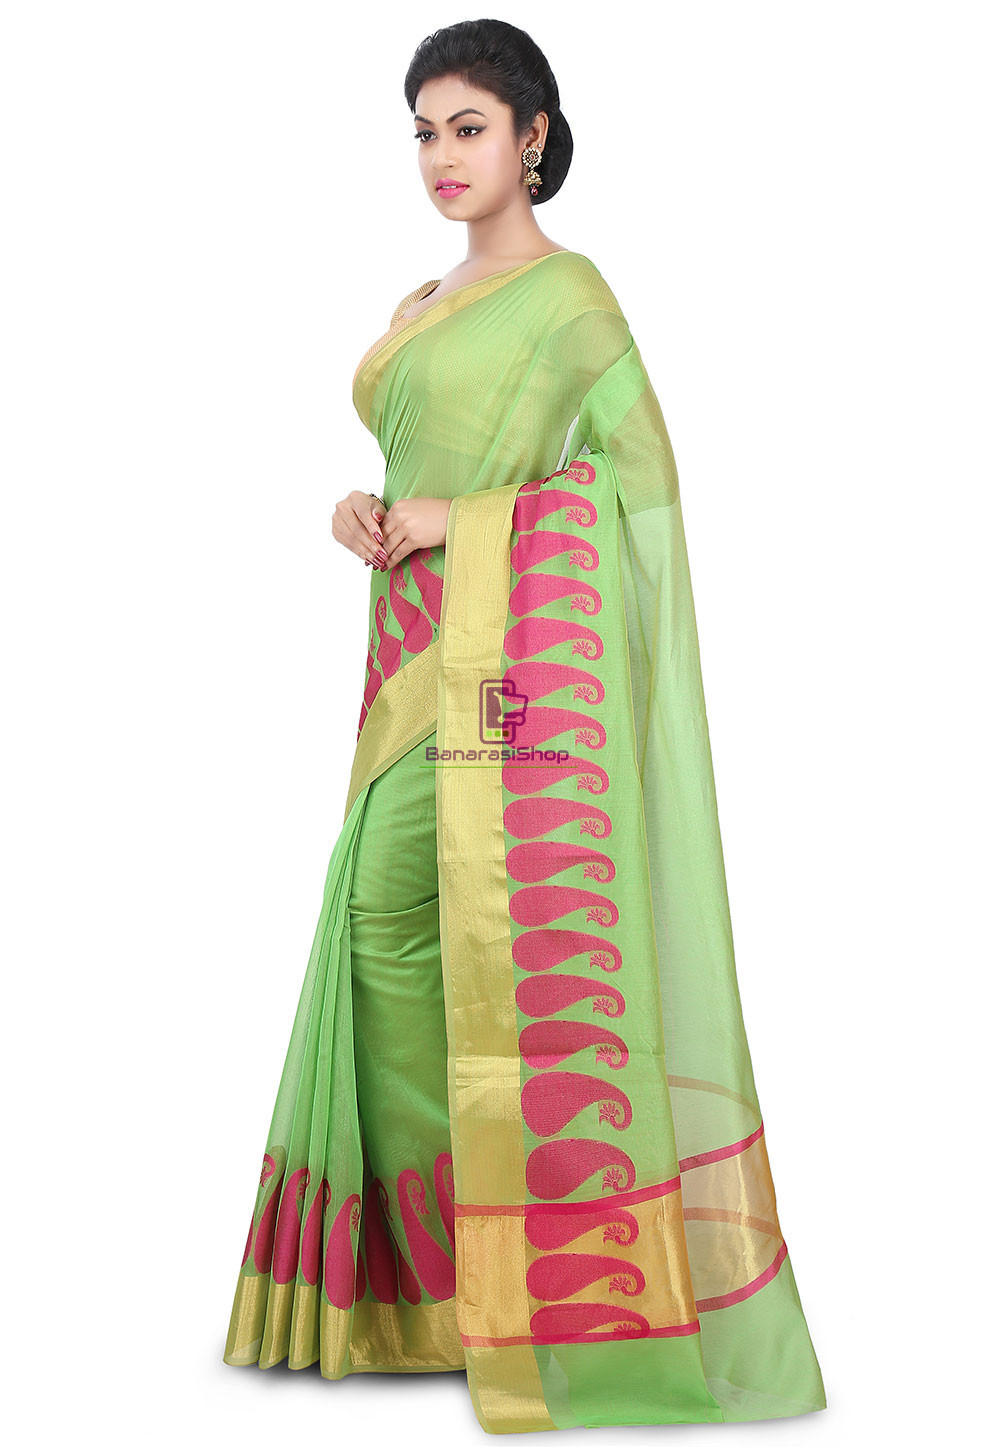 Woven Banarasi Chanderi Cotton Saree in Light Green 5